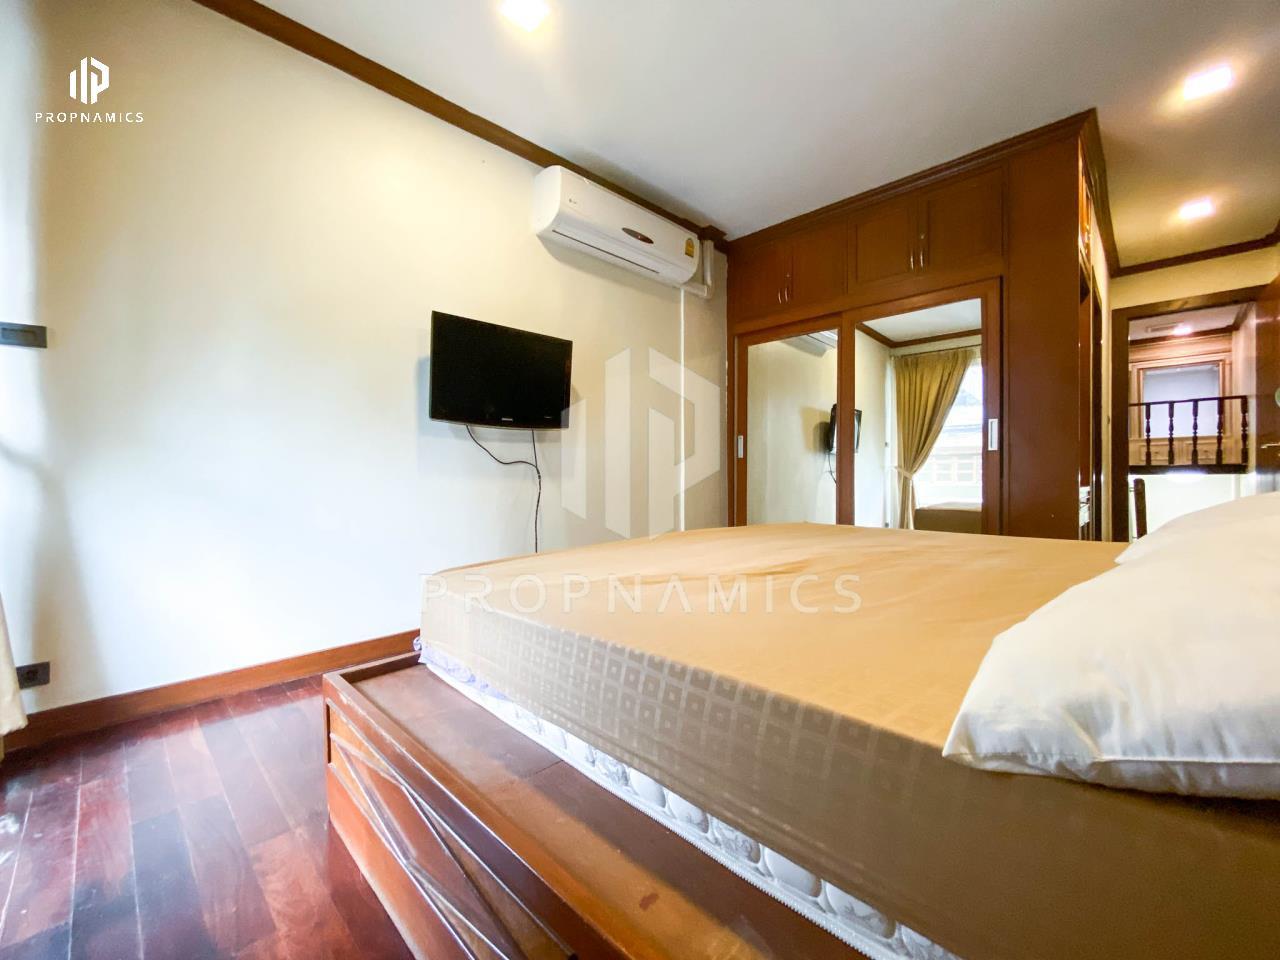 Propnamics Co., Ltd Agency's FOR RENT: SINGLE HOUSE IN SUKHUMVIT 26 13